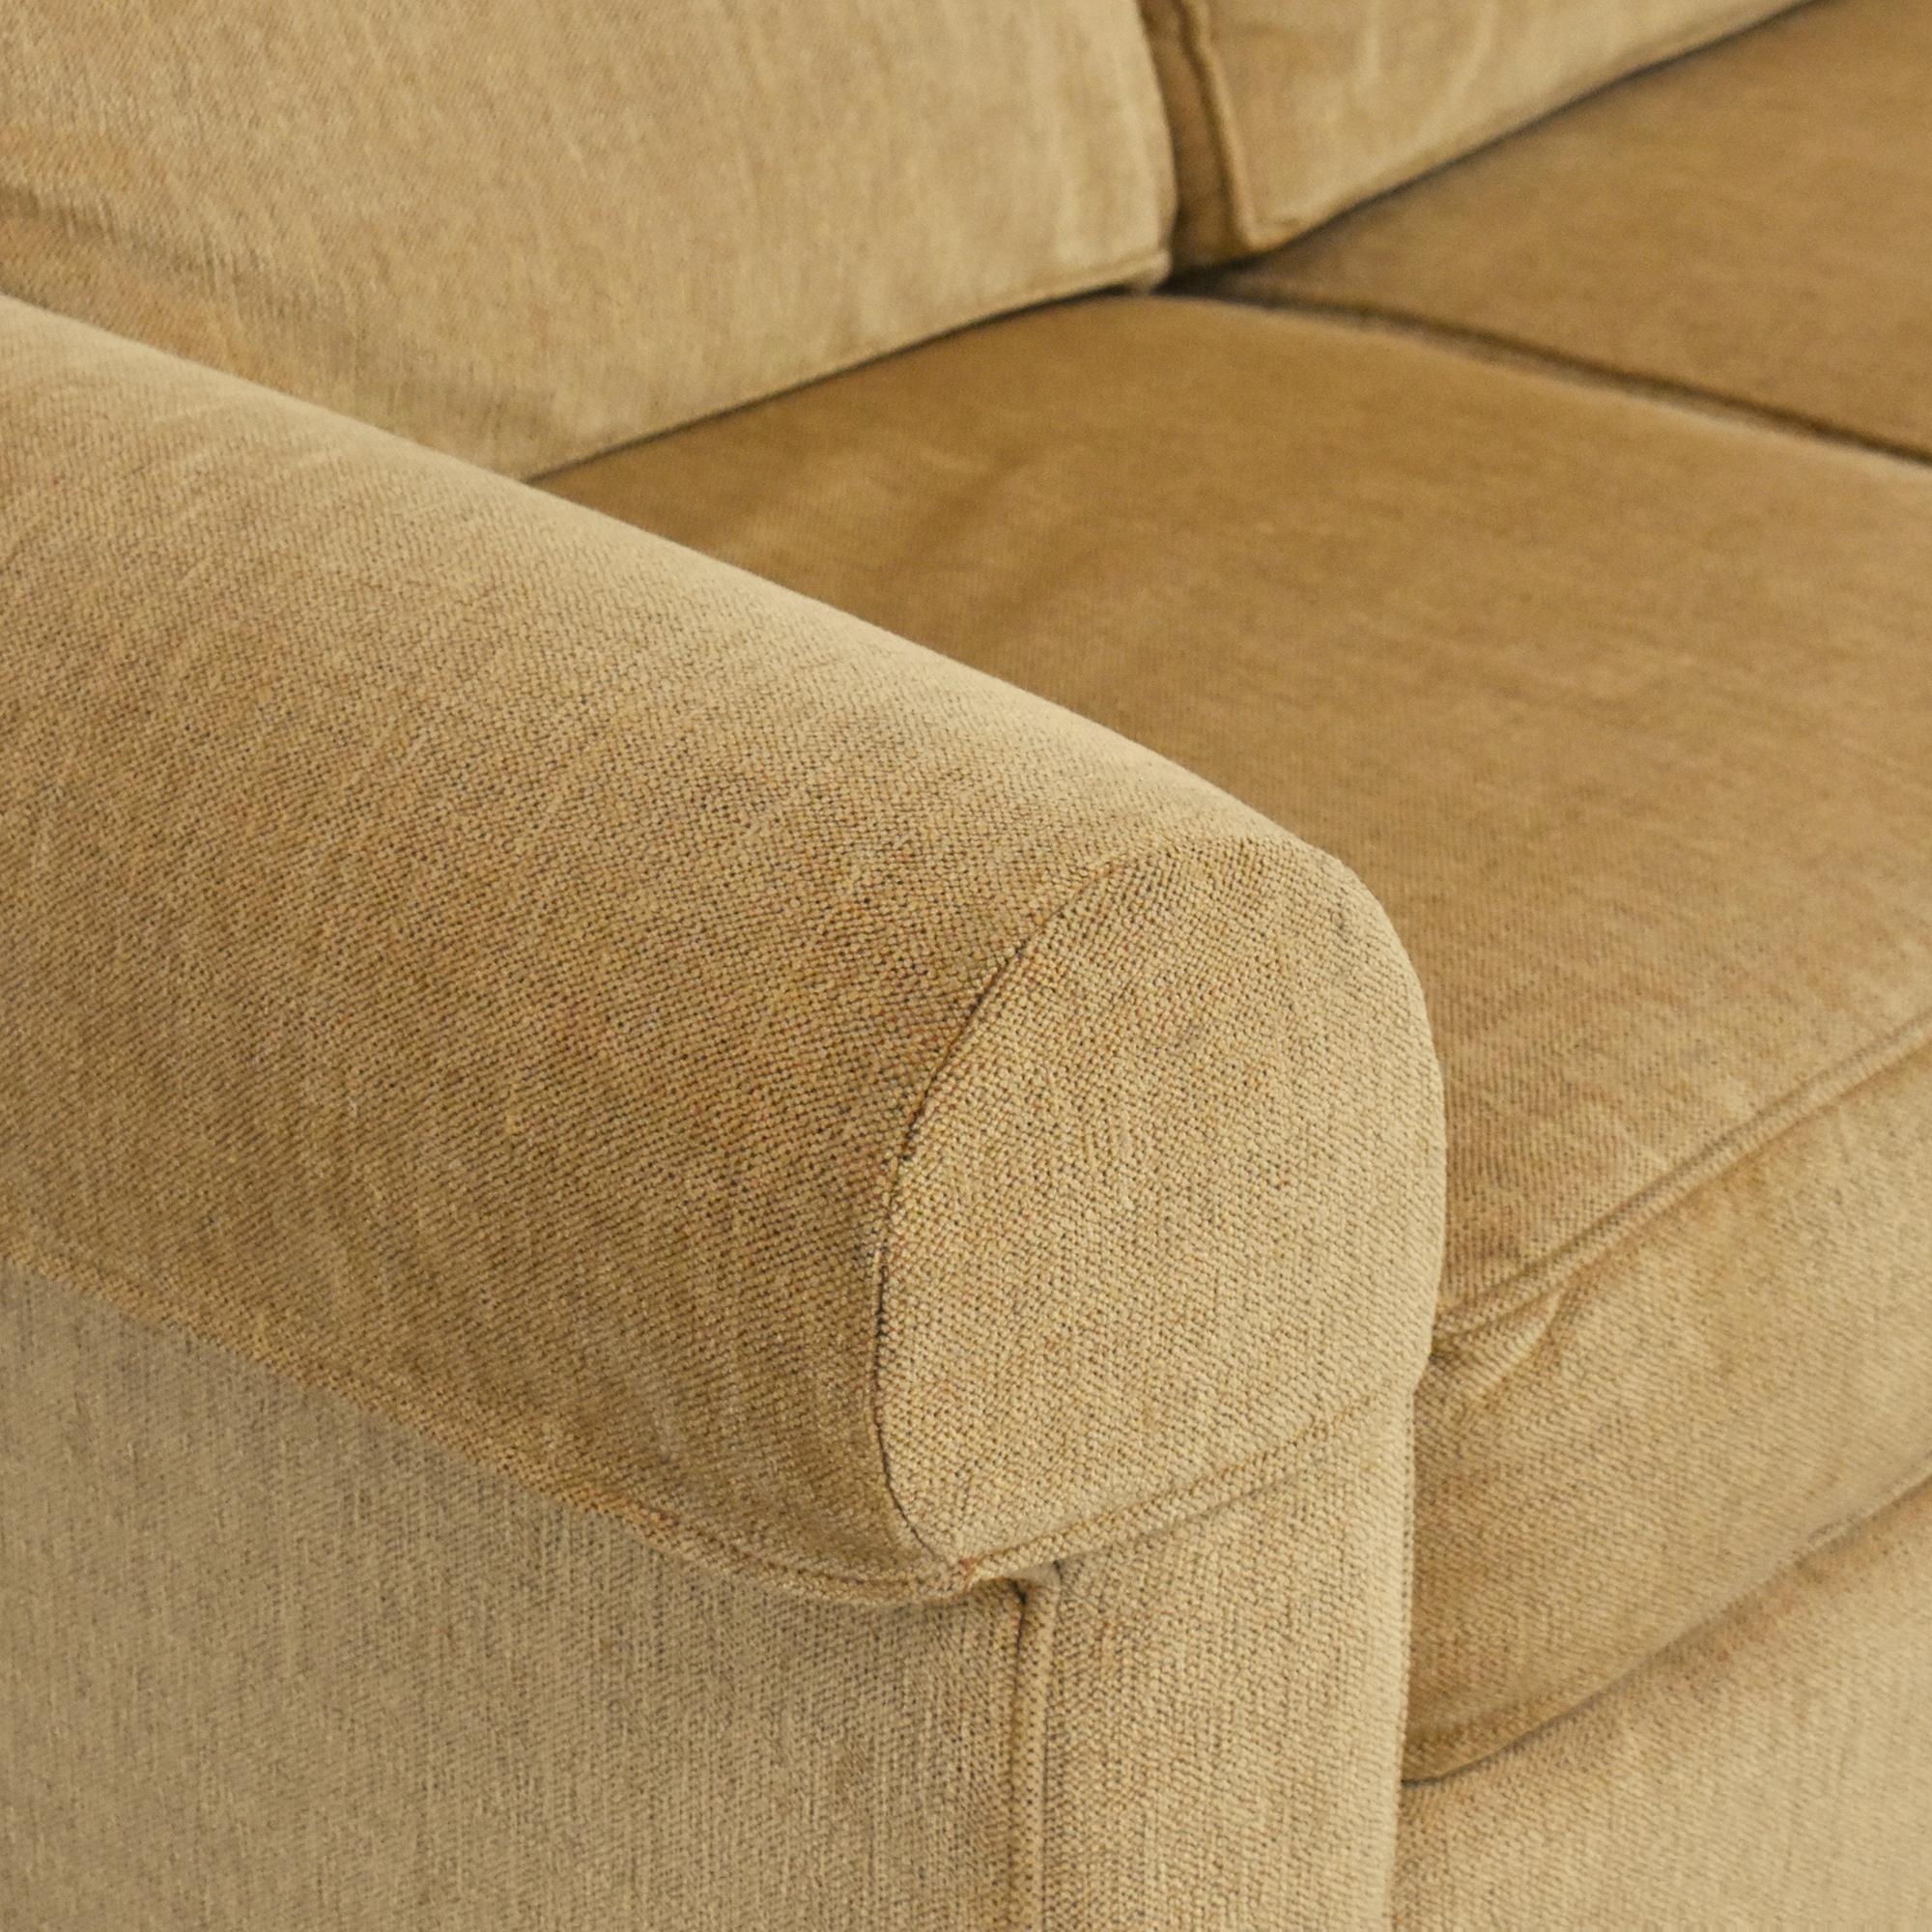 shop Ethan Allen Retreat Roll-Arm Three-Piece Sectional Sofa Ethan Allen